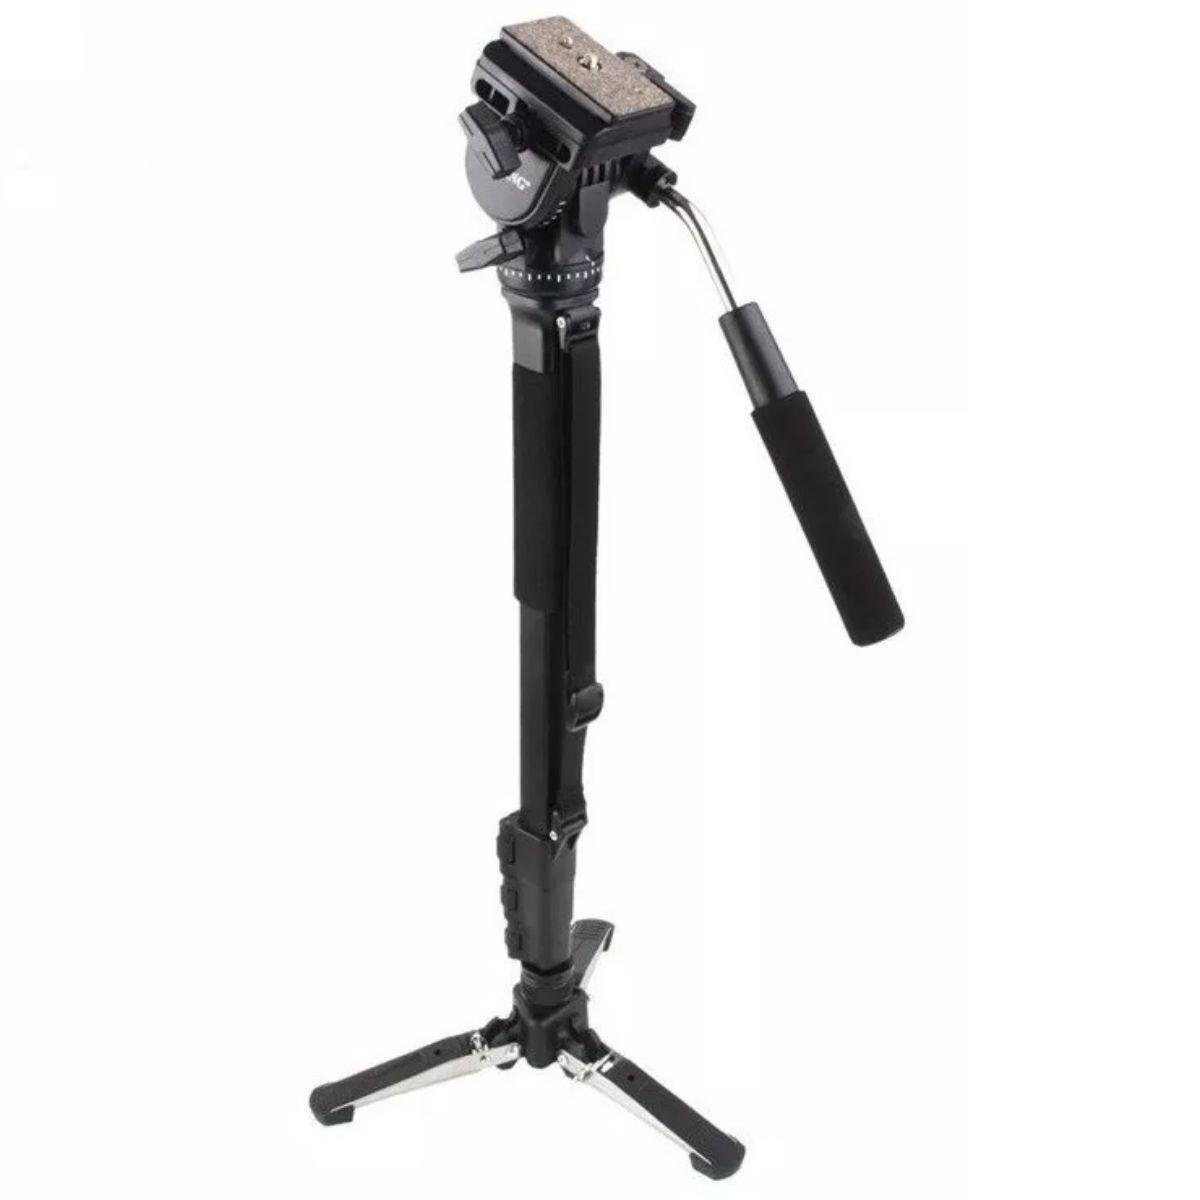 Monopé Profissional Para Câmera Cabeça Hidráulica Yunteng Vct-288